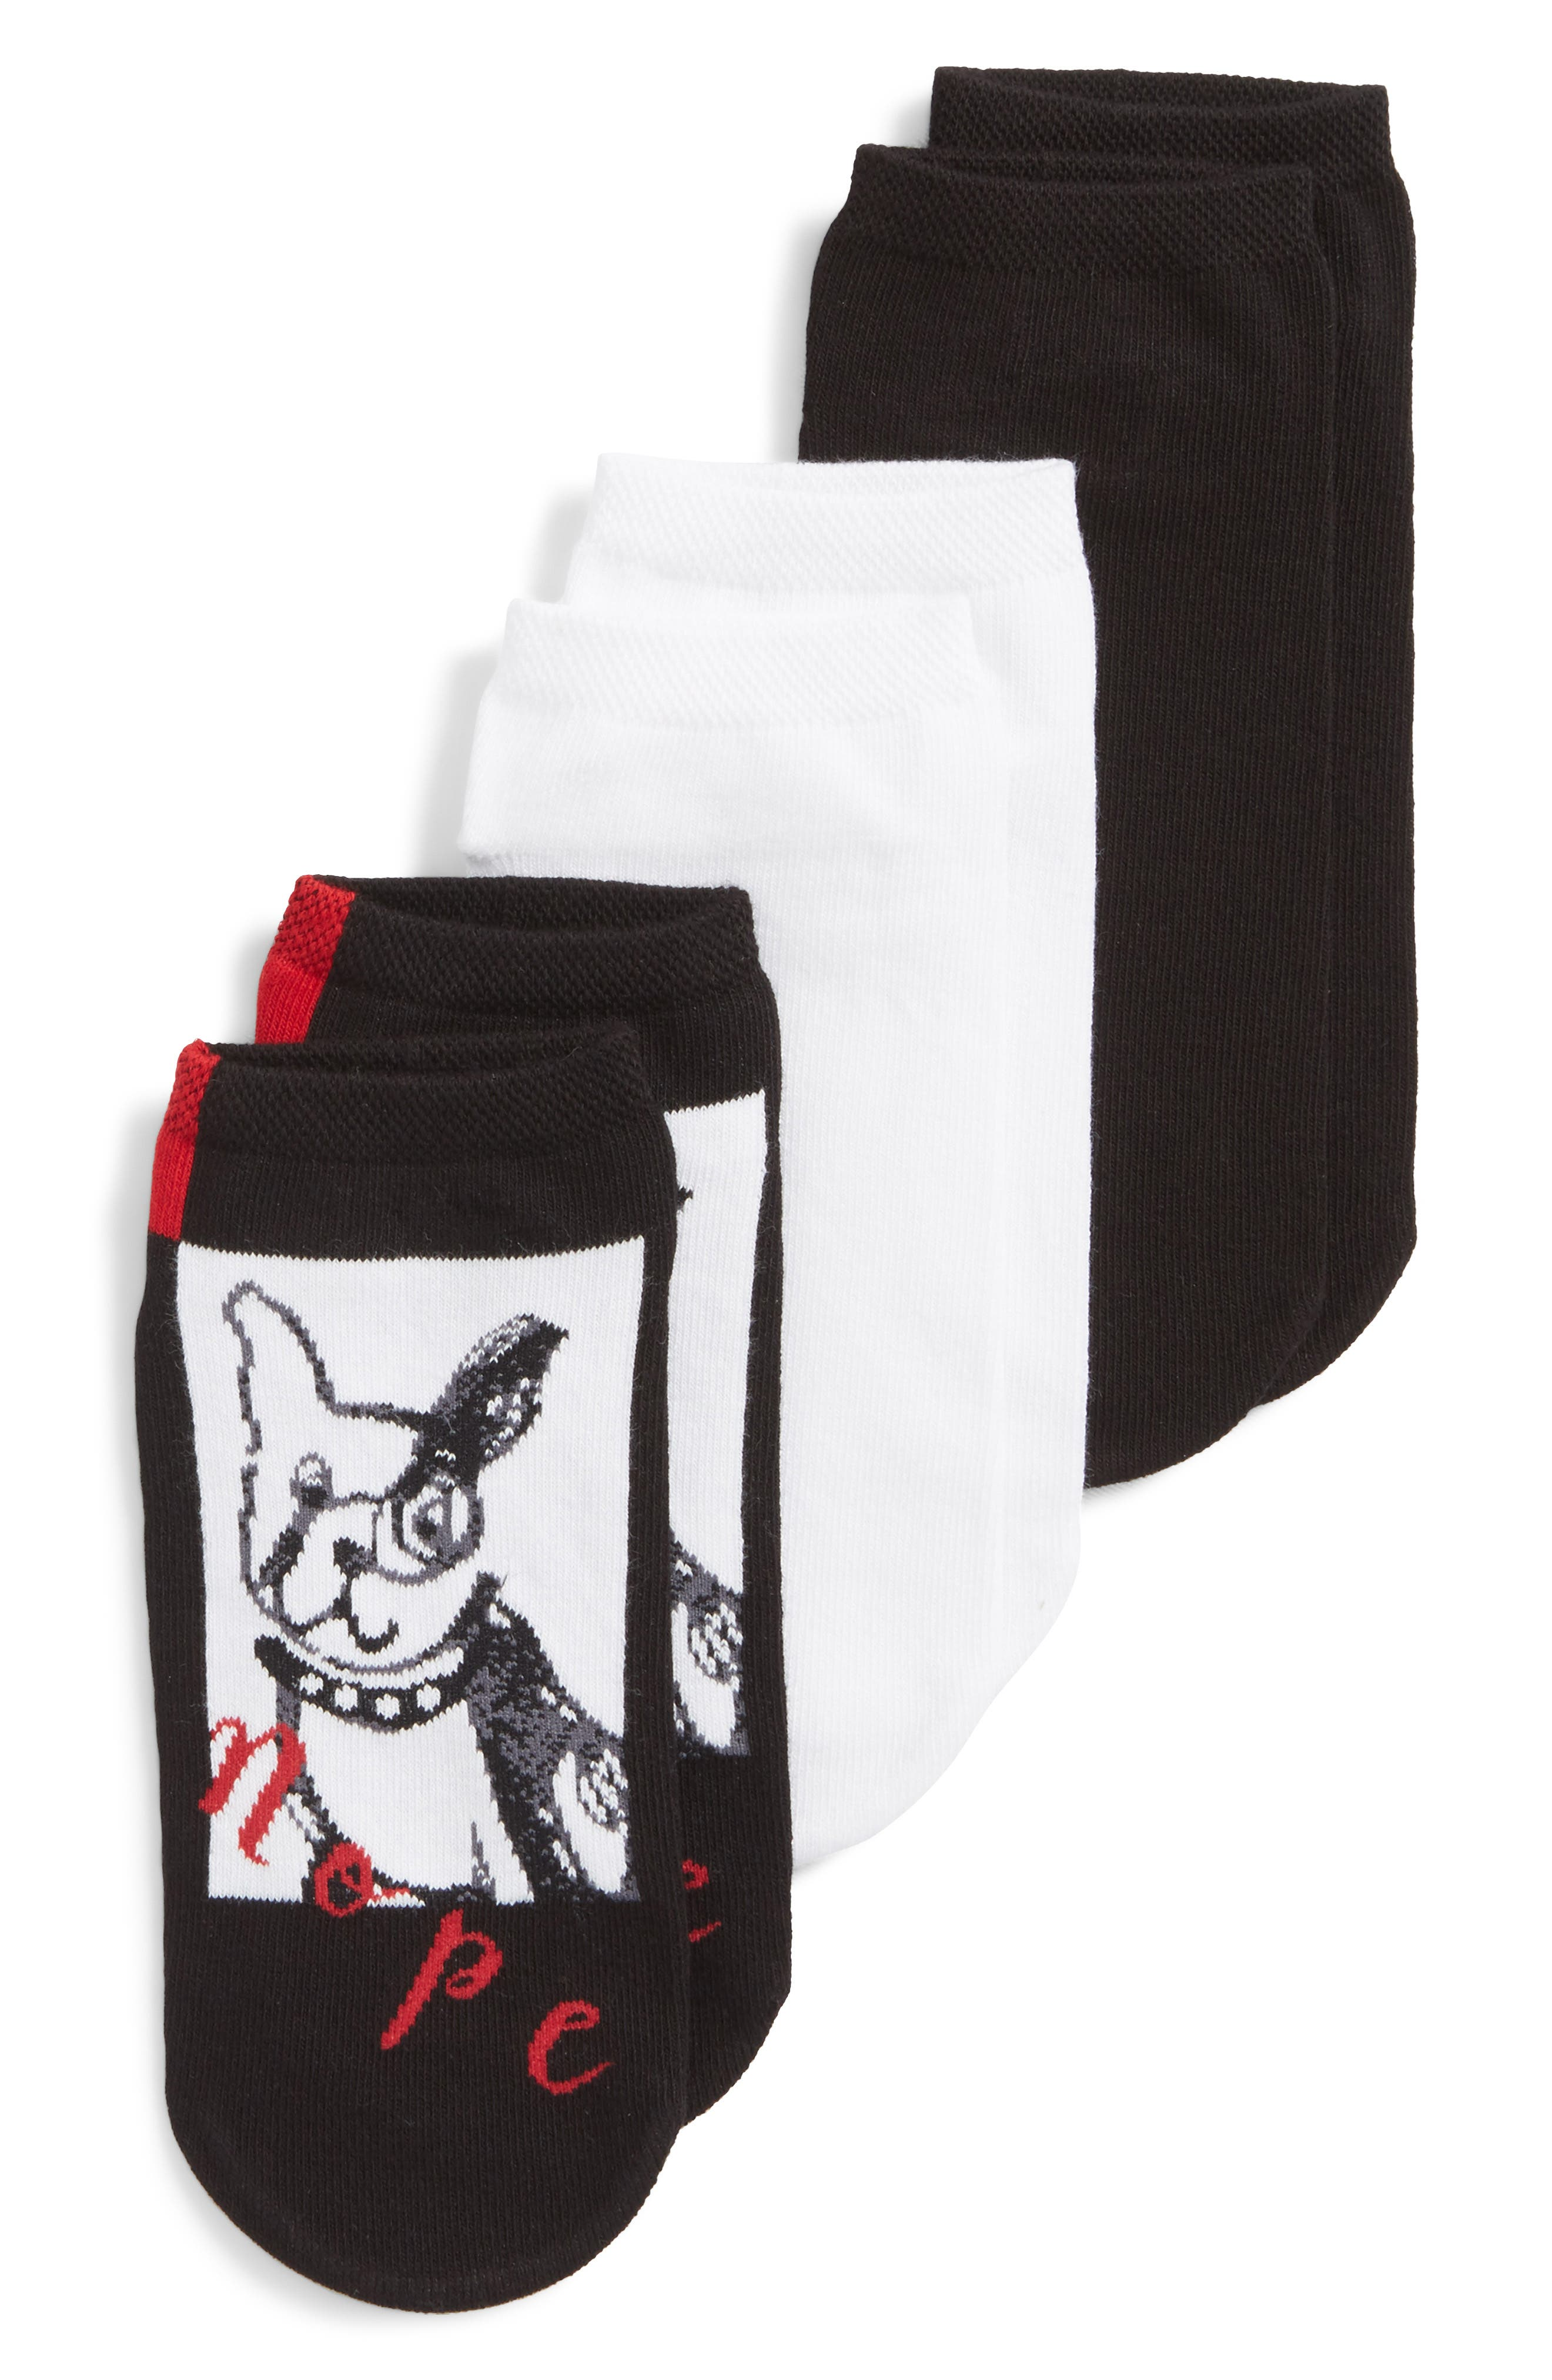 Stubborn Dog 3-Pack Socks,                         Main,                         color, Black